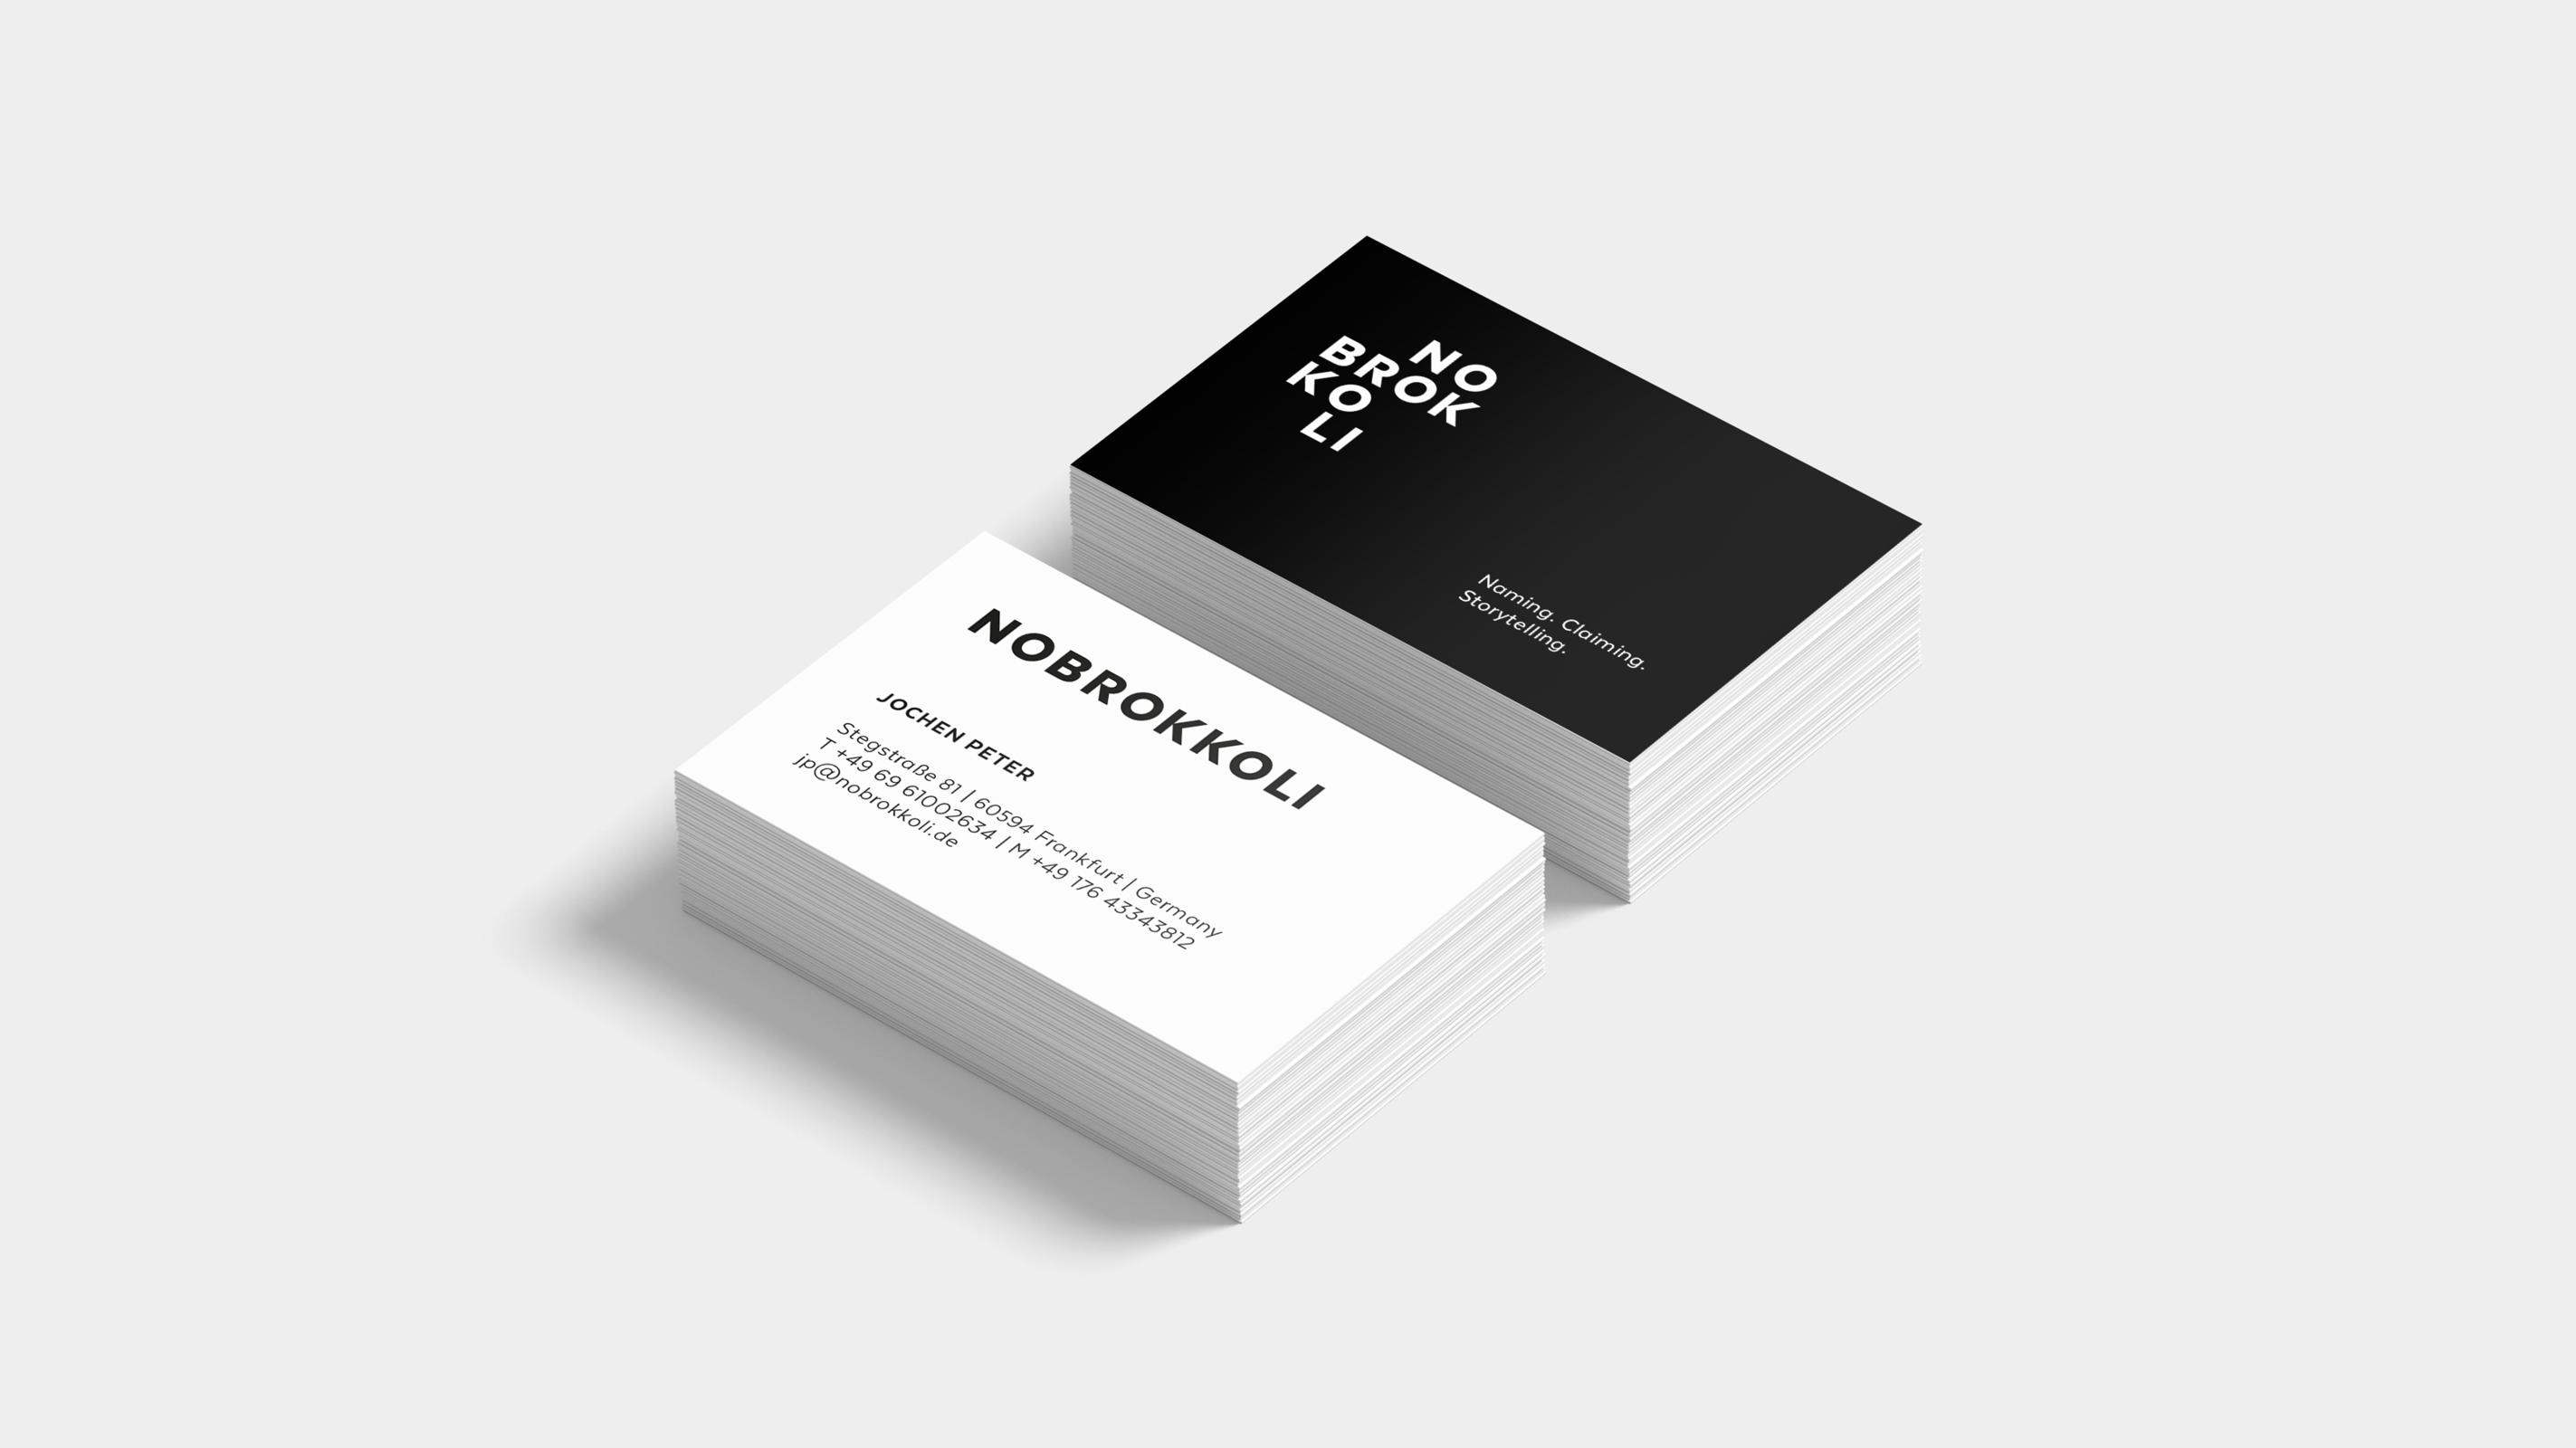 Nobrokkoli – Poarangan Brand Design3